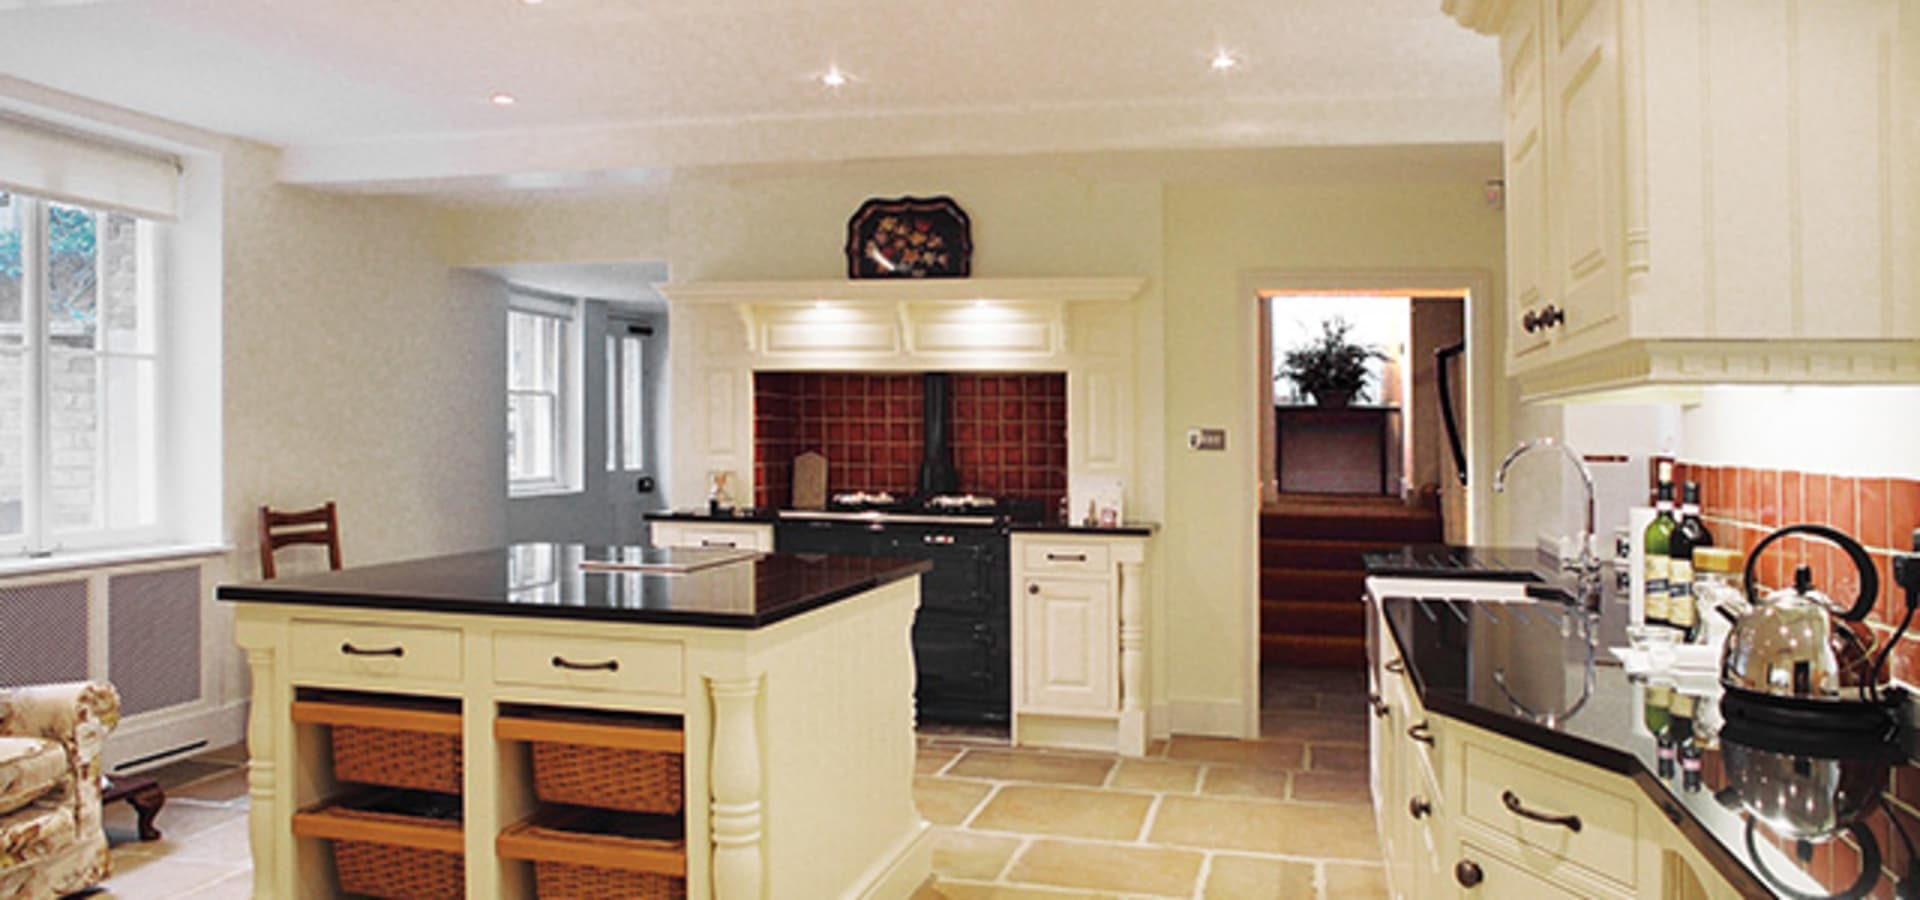 David Haugh Bespoke Kitchens Design